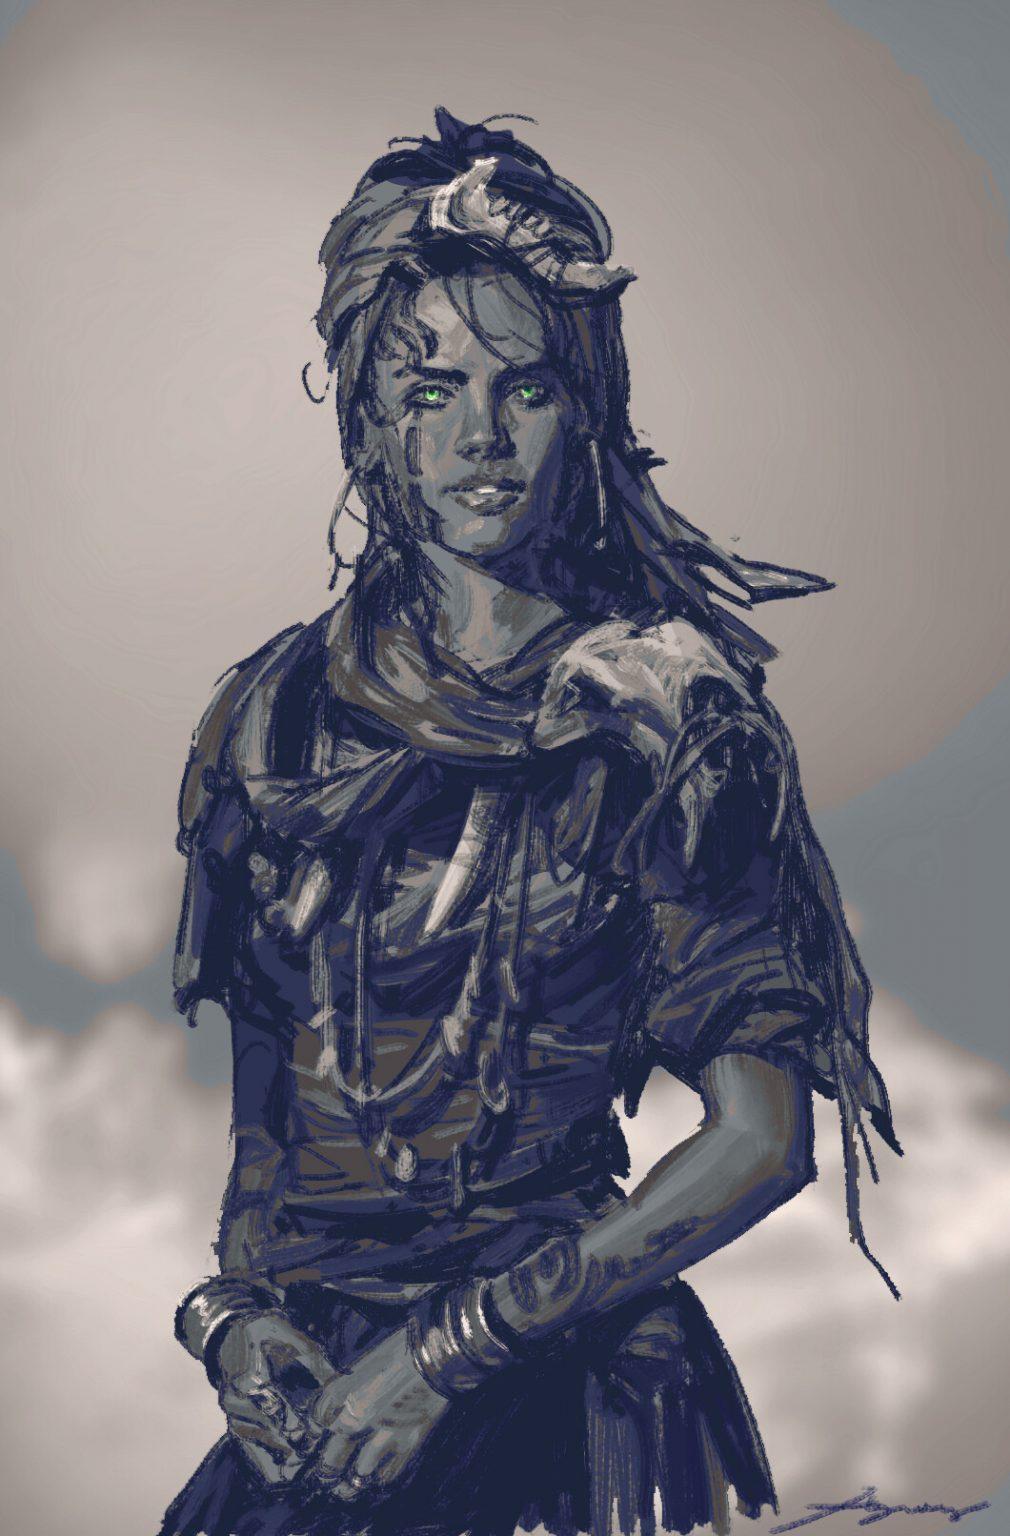 Naughty-Dog-Artwork-2-1010x1536.jpg